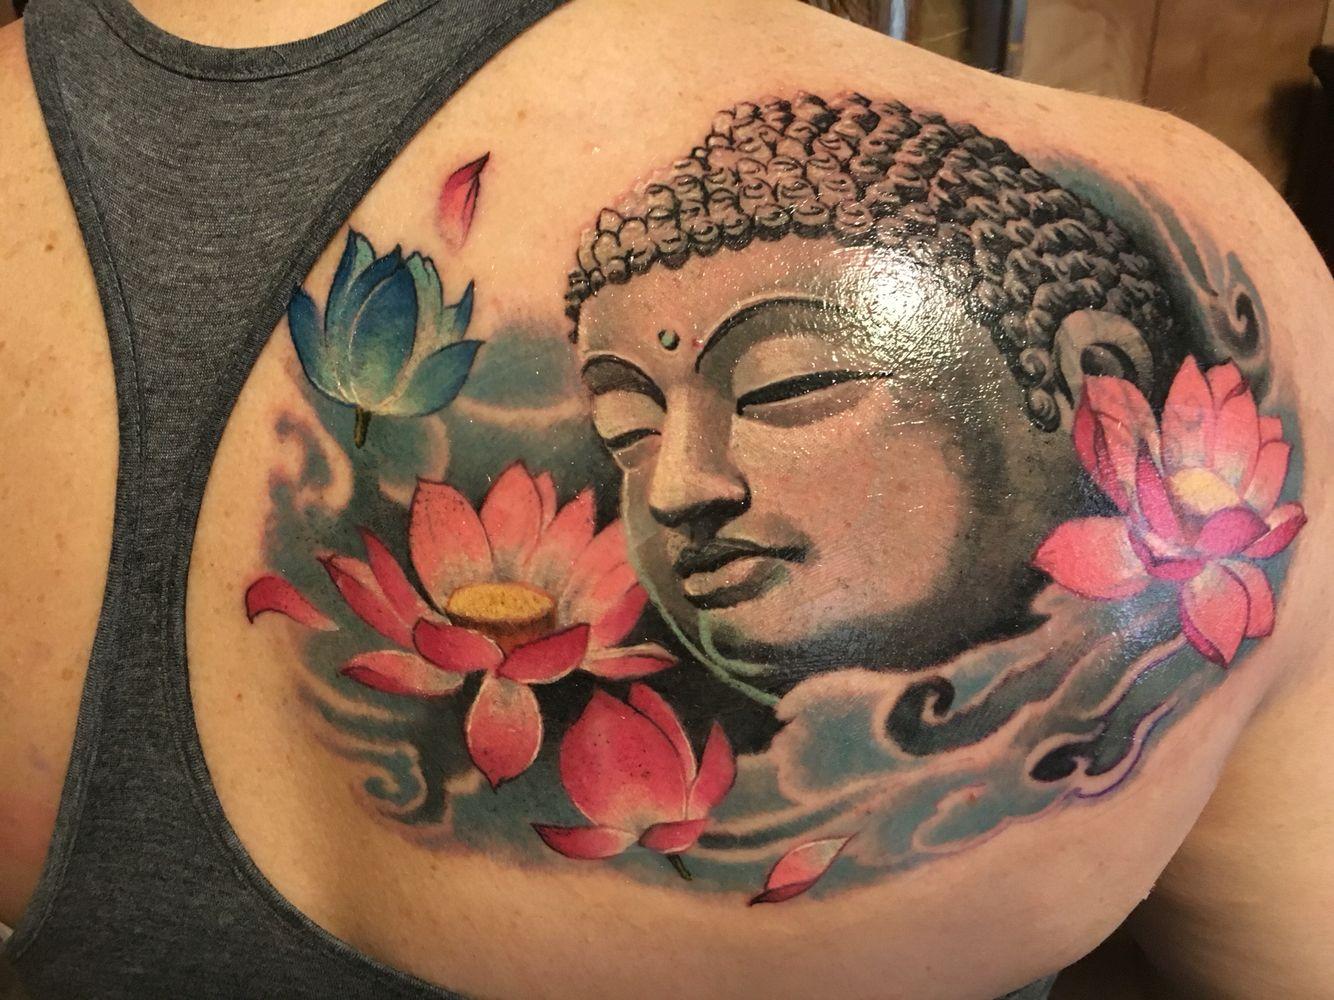 Buddha And Lotus Tattoo By Mike At Big Buddha Tattoo Studio In Lubbock Tx Buddha Tattoo Buddha Tattoos Spiritual Tattoos